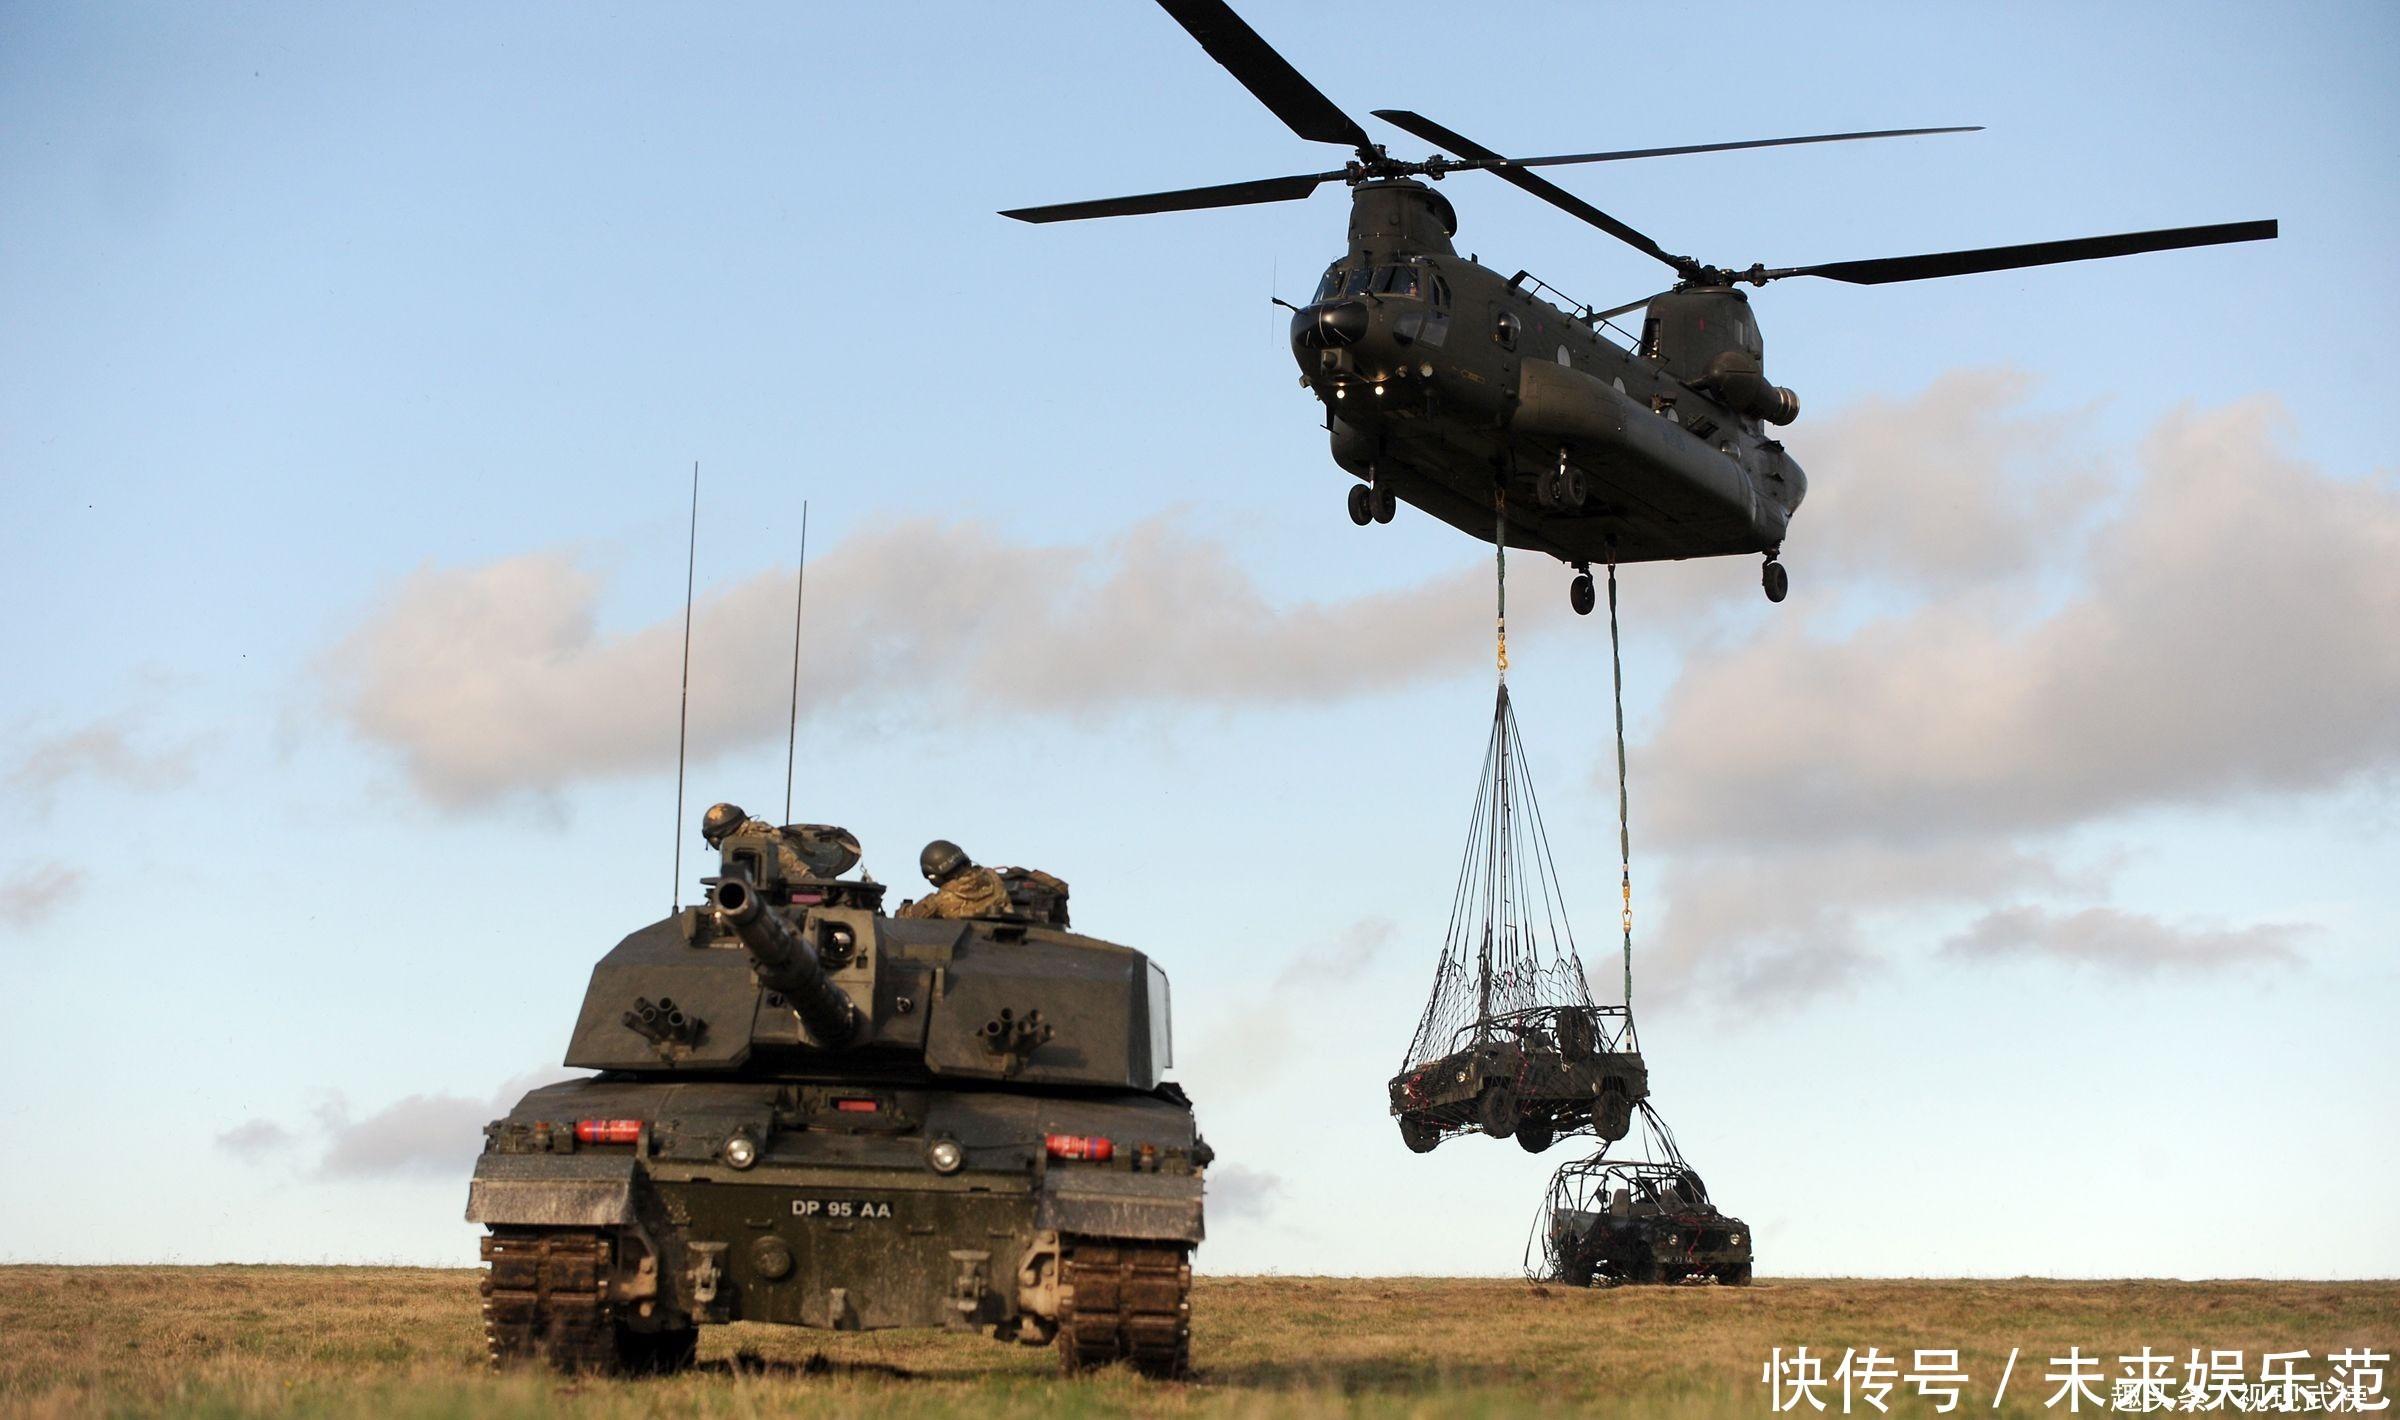 <b>没想到吧?中国竟购买过这么多美国武器,从飞机到鱼雷一应俱全</b>